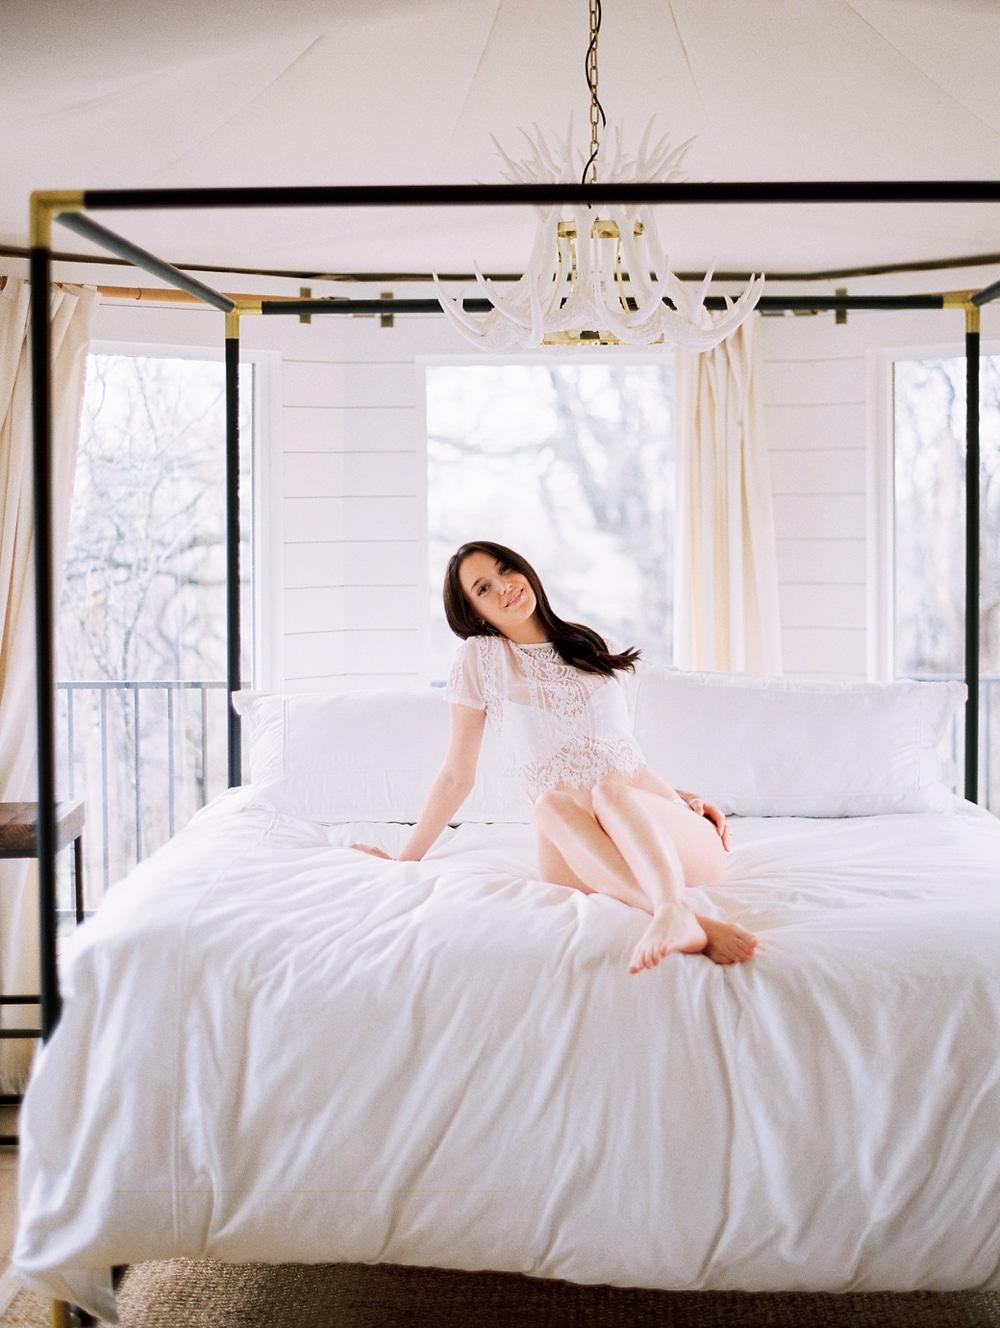 Kristin-La-Voie-Photography-fine-art-wedding-bridal-boudoir-texas-photographer-Dallas-Austin-San-Marcos-wahwahtaysee-resort-126